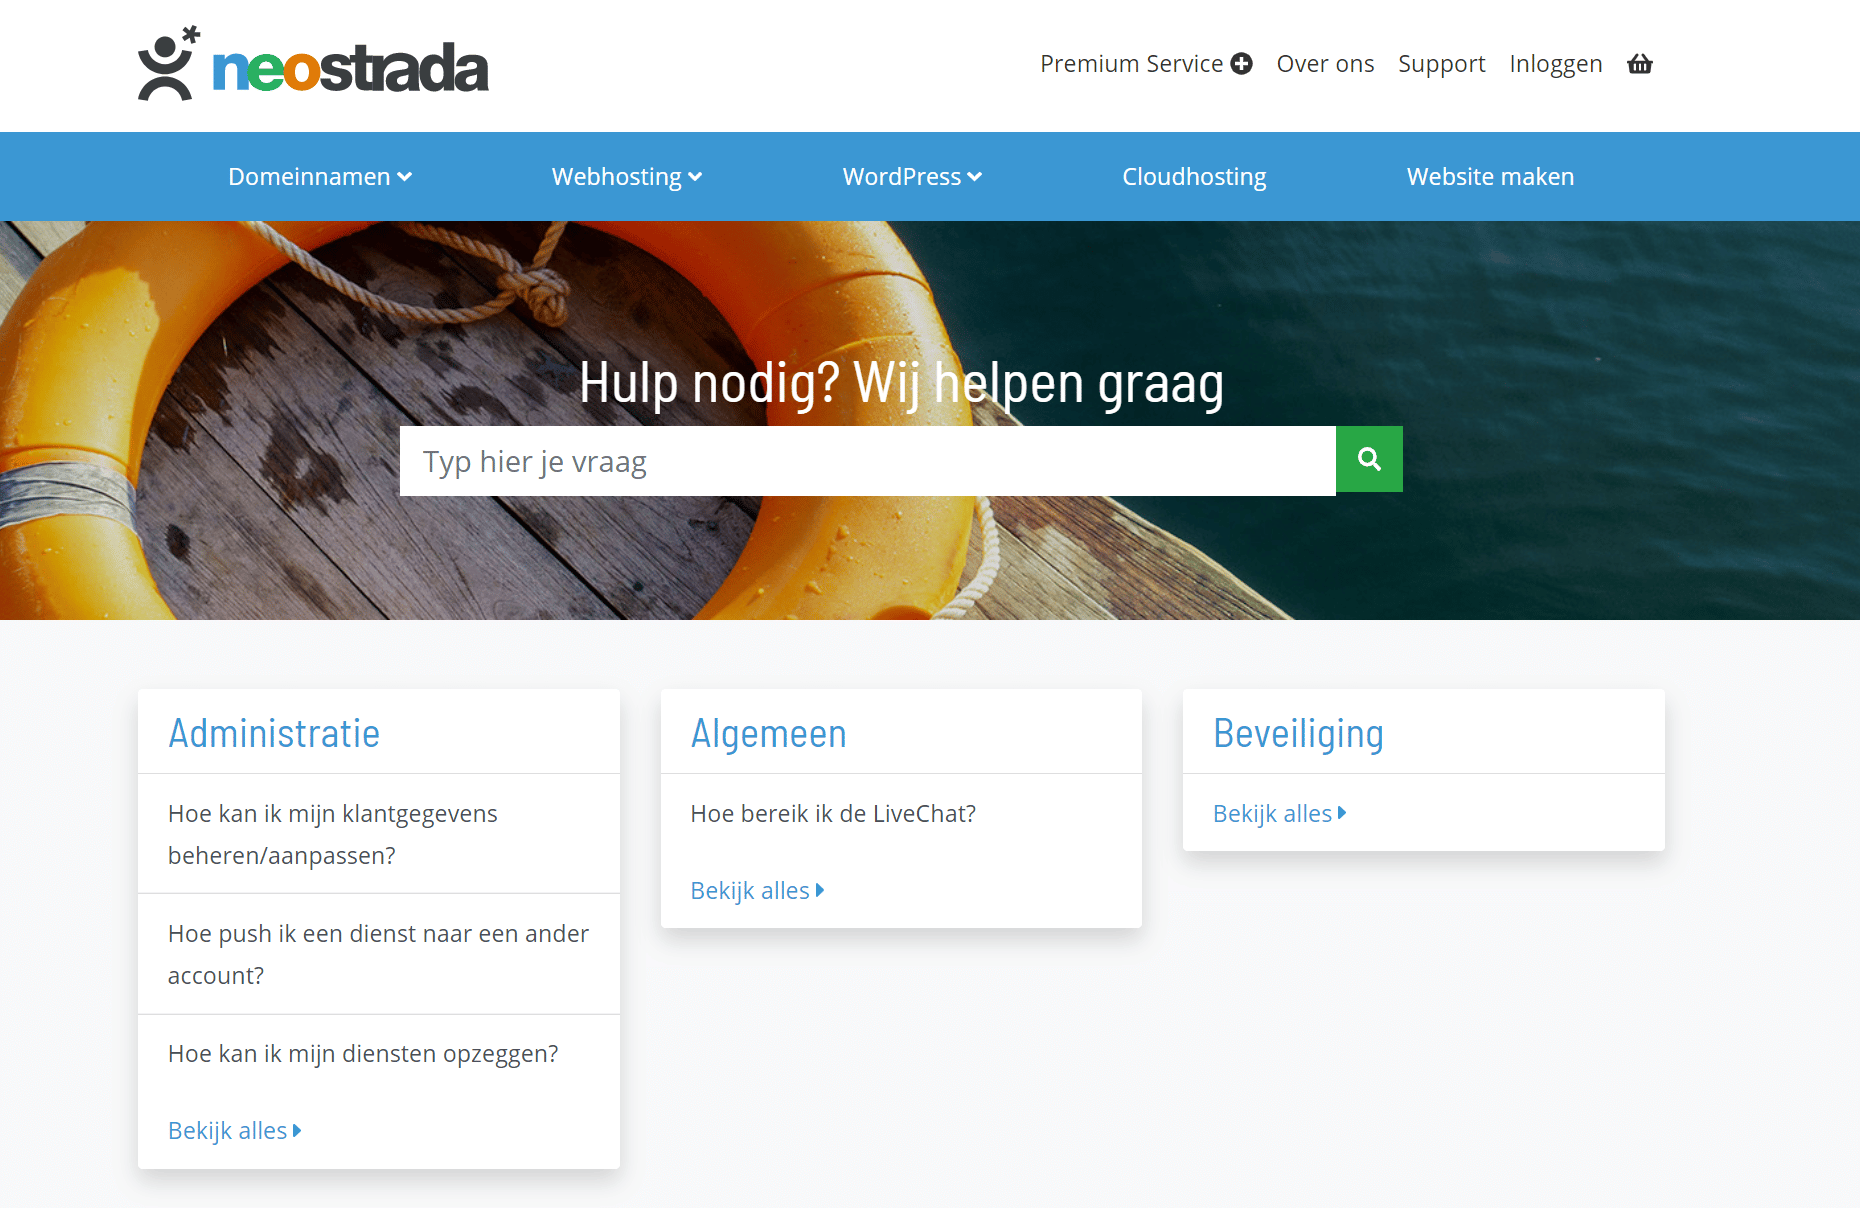 Neostrada-hosting-klantenservice